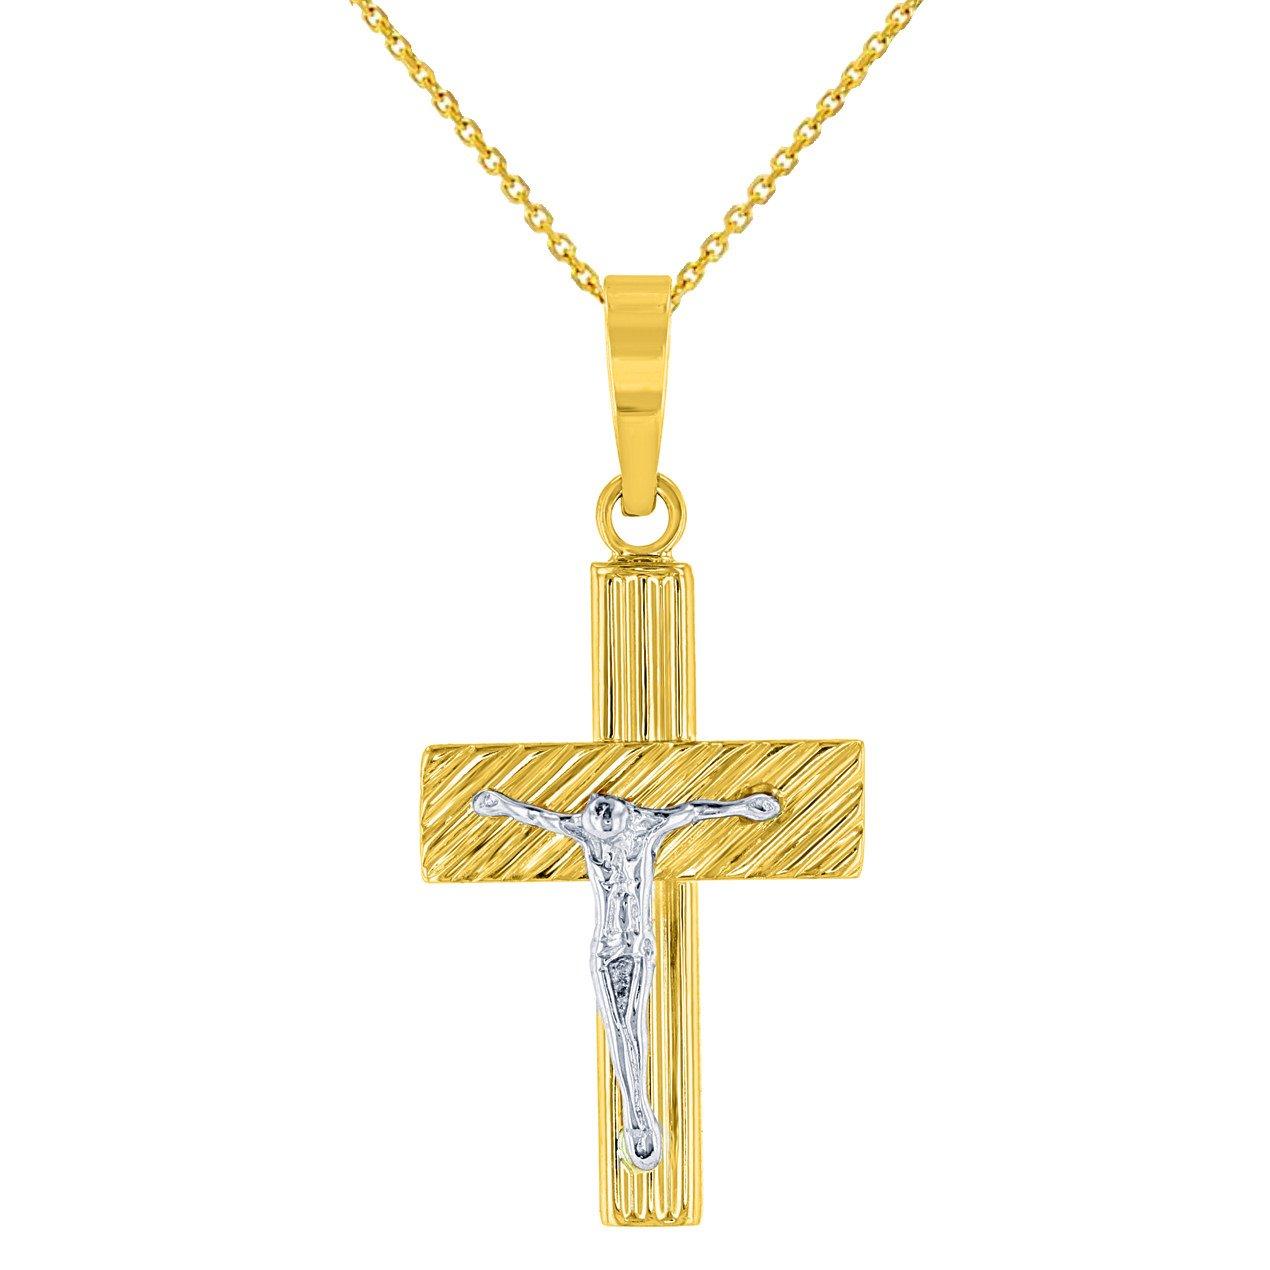 14K Two-Tone Gold Cross Crucifix Pendant